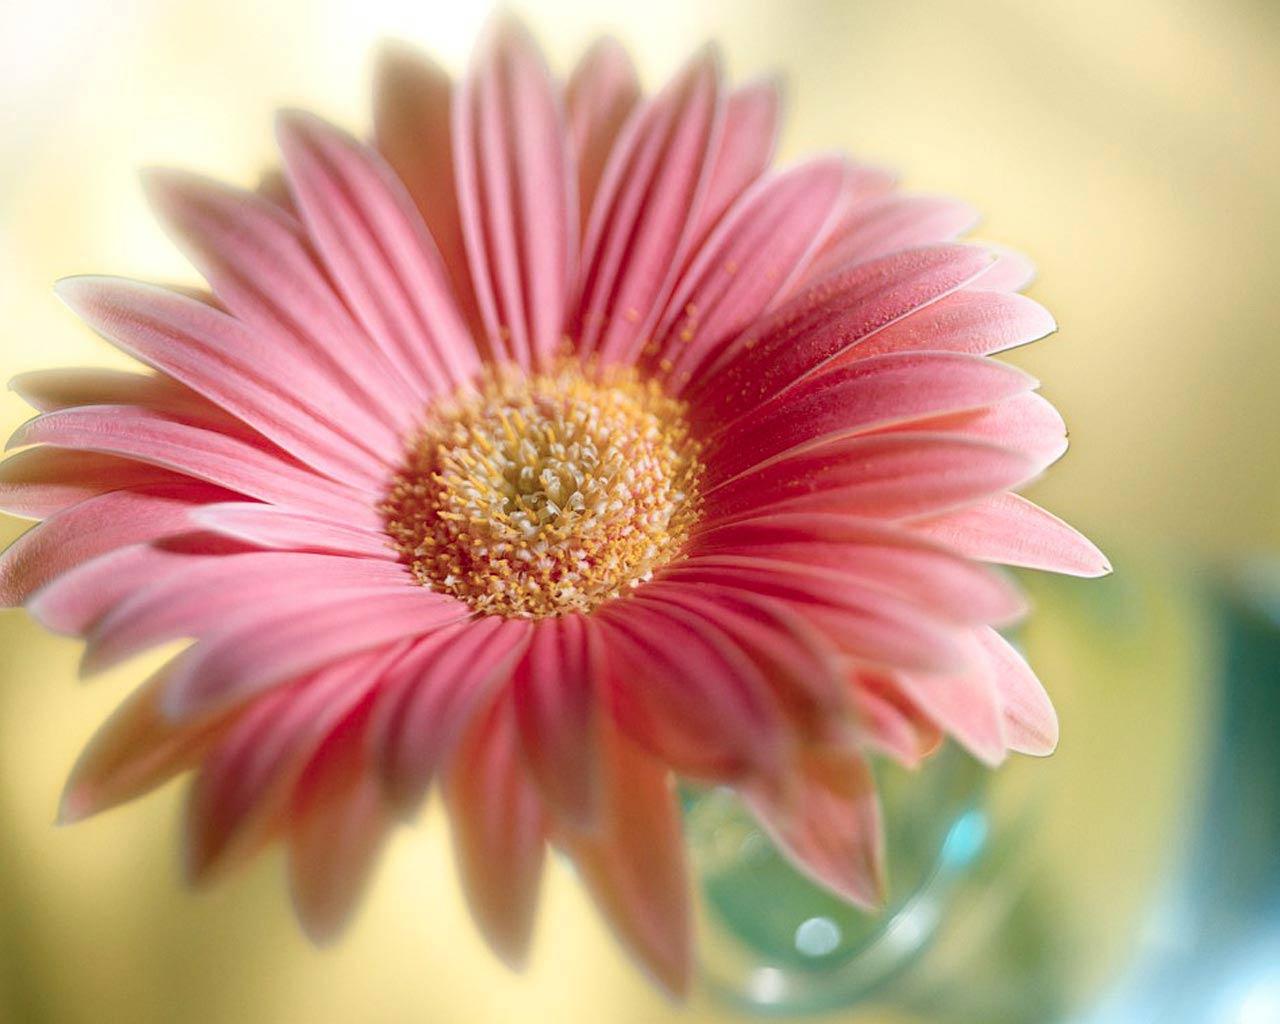 http://3.bp.blogspot.com/-n2k3tqpGOuI/ULz37yknxAI/AAAAAAAAap8/xpI3svwX4yk/s1600/Flowers%20wallpapers%20HD%20desktop%20Beautiful%20back%20grounds.%20(4).jpg